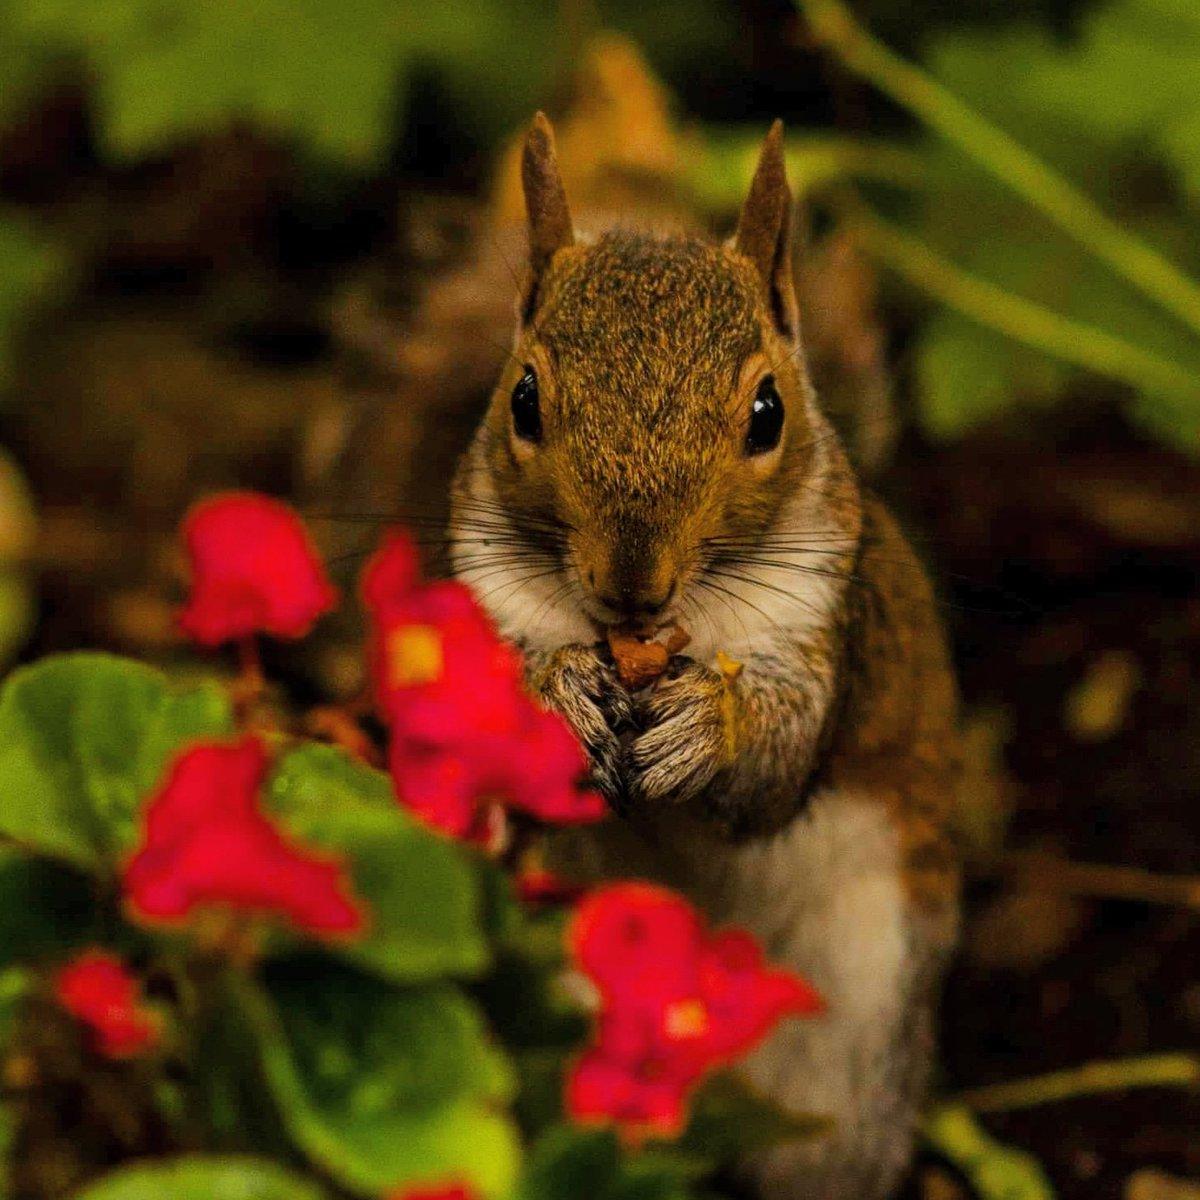 Have a great Friday! #squirrel #squirrelphoto #squirrelsofinstagram #orava #kurre #ekorre #animal #animalover #naturephotography #nature #beautyofnature #animalportrait #squirrelportrait #londonsquirrelpic.twitter.com/T8CygEbmYa